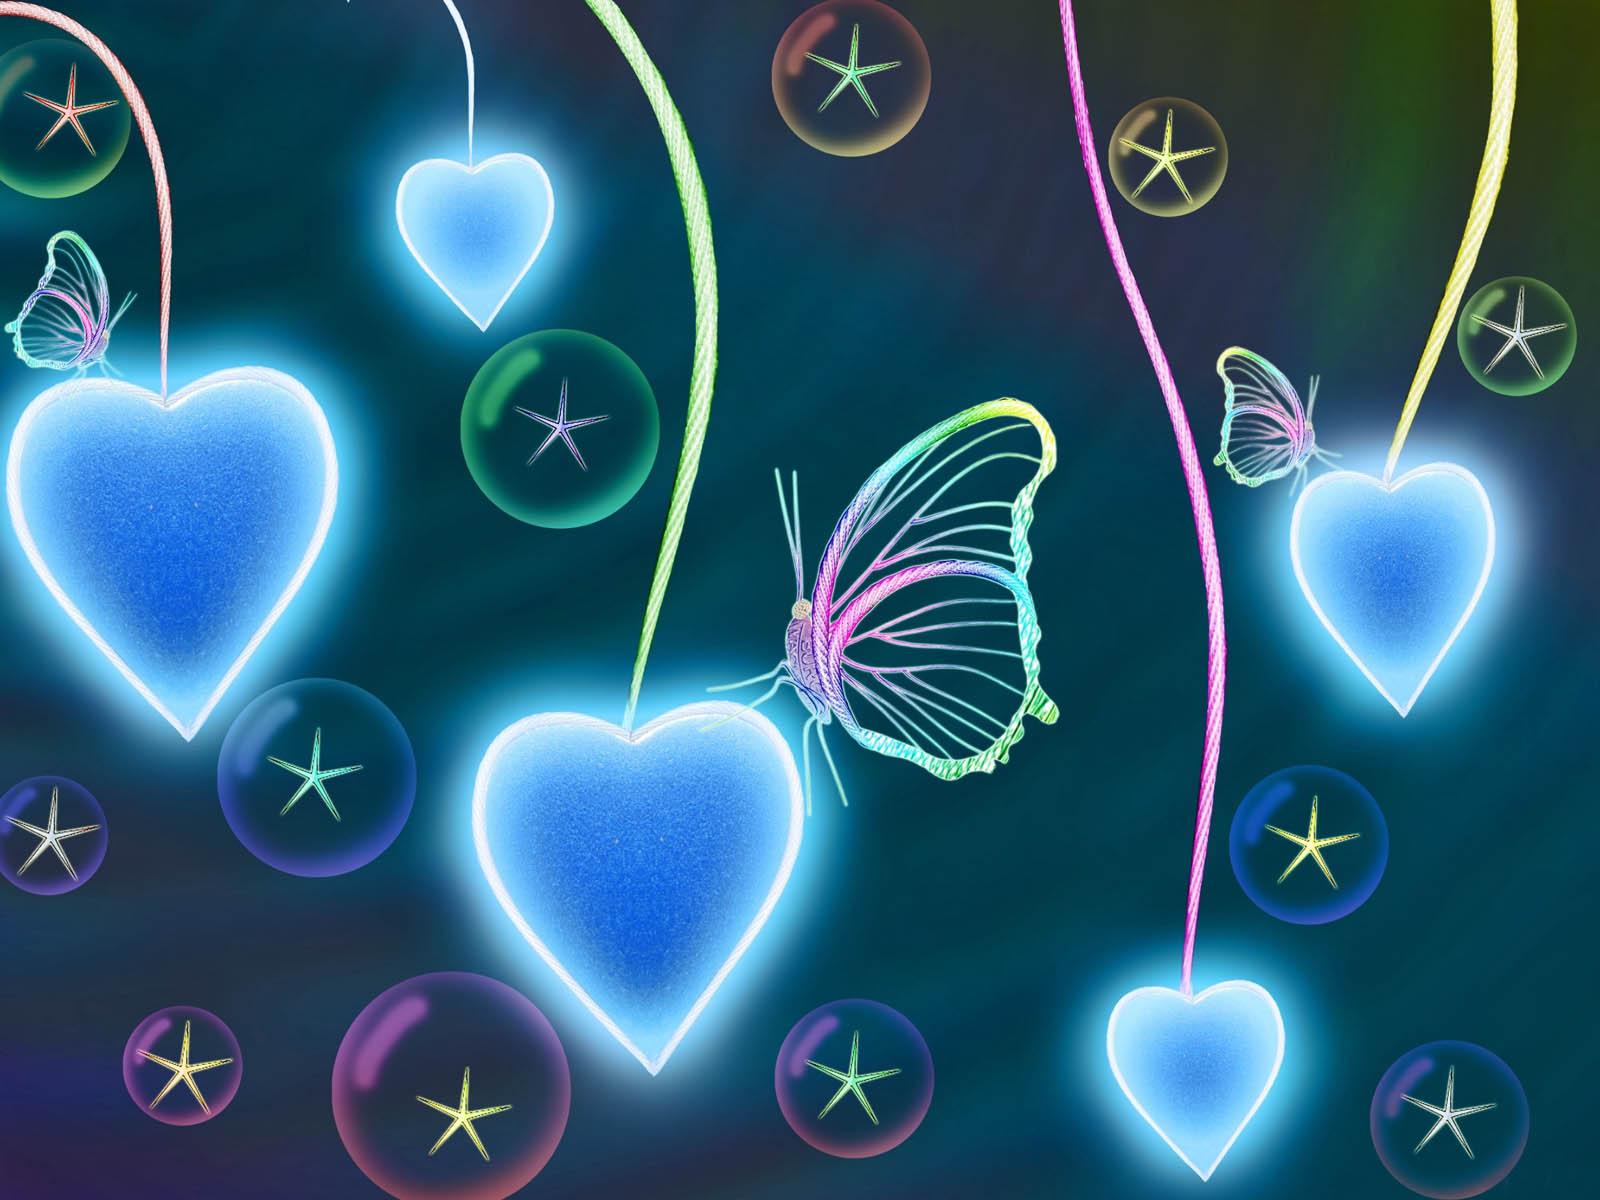 Wallpaper butterfly love wallpapers - Love wallpaper background ...